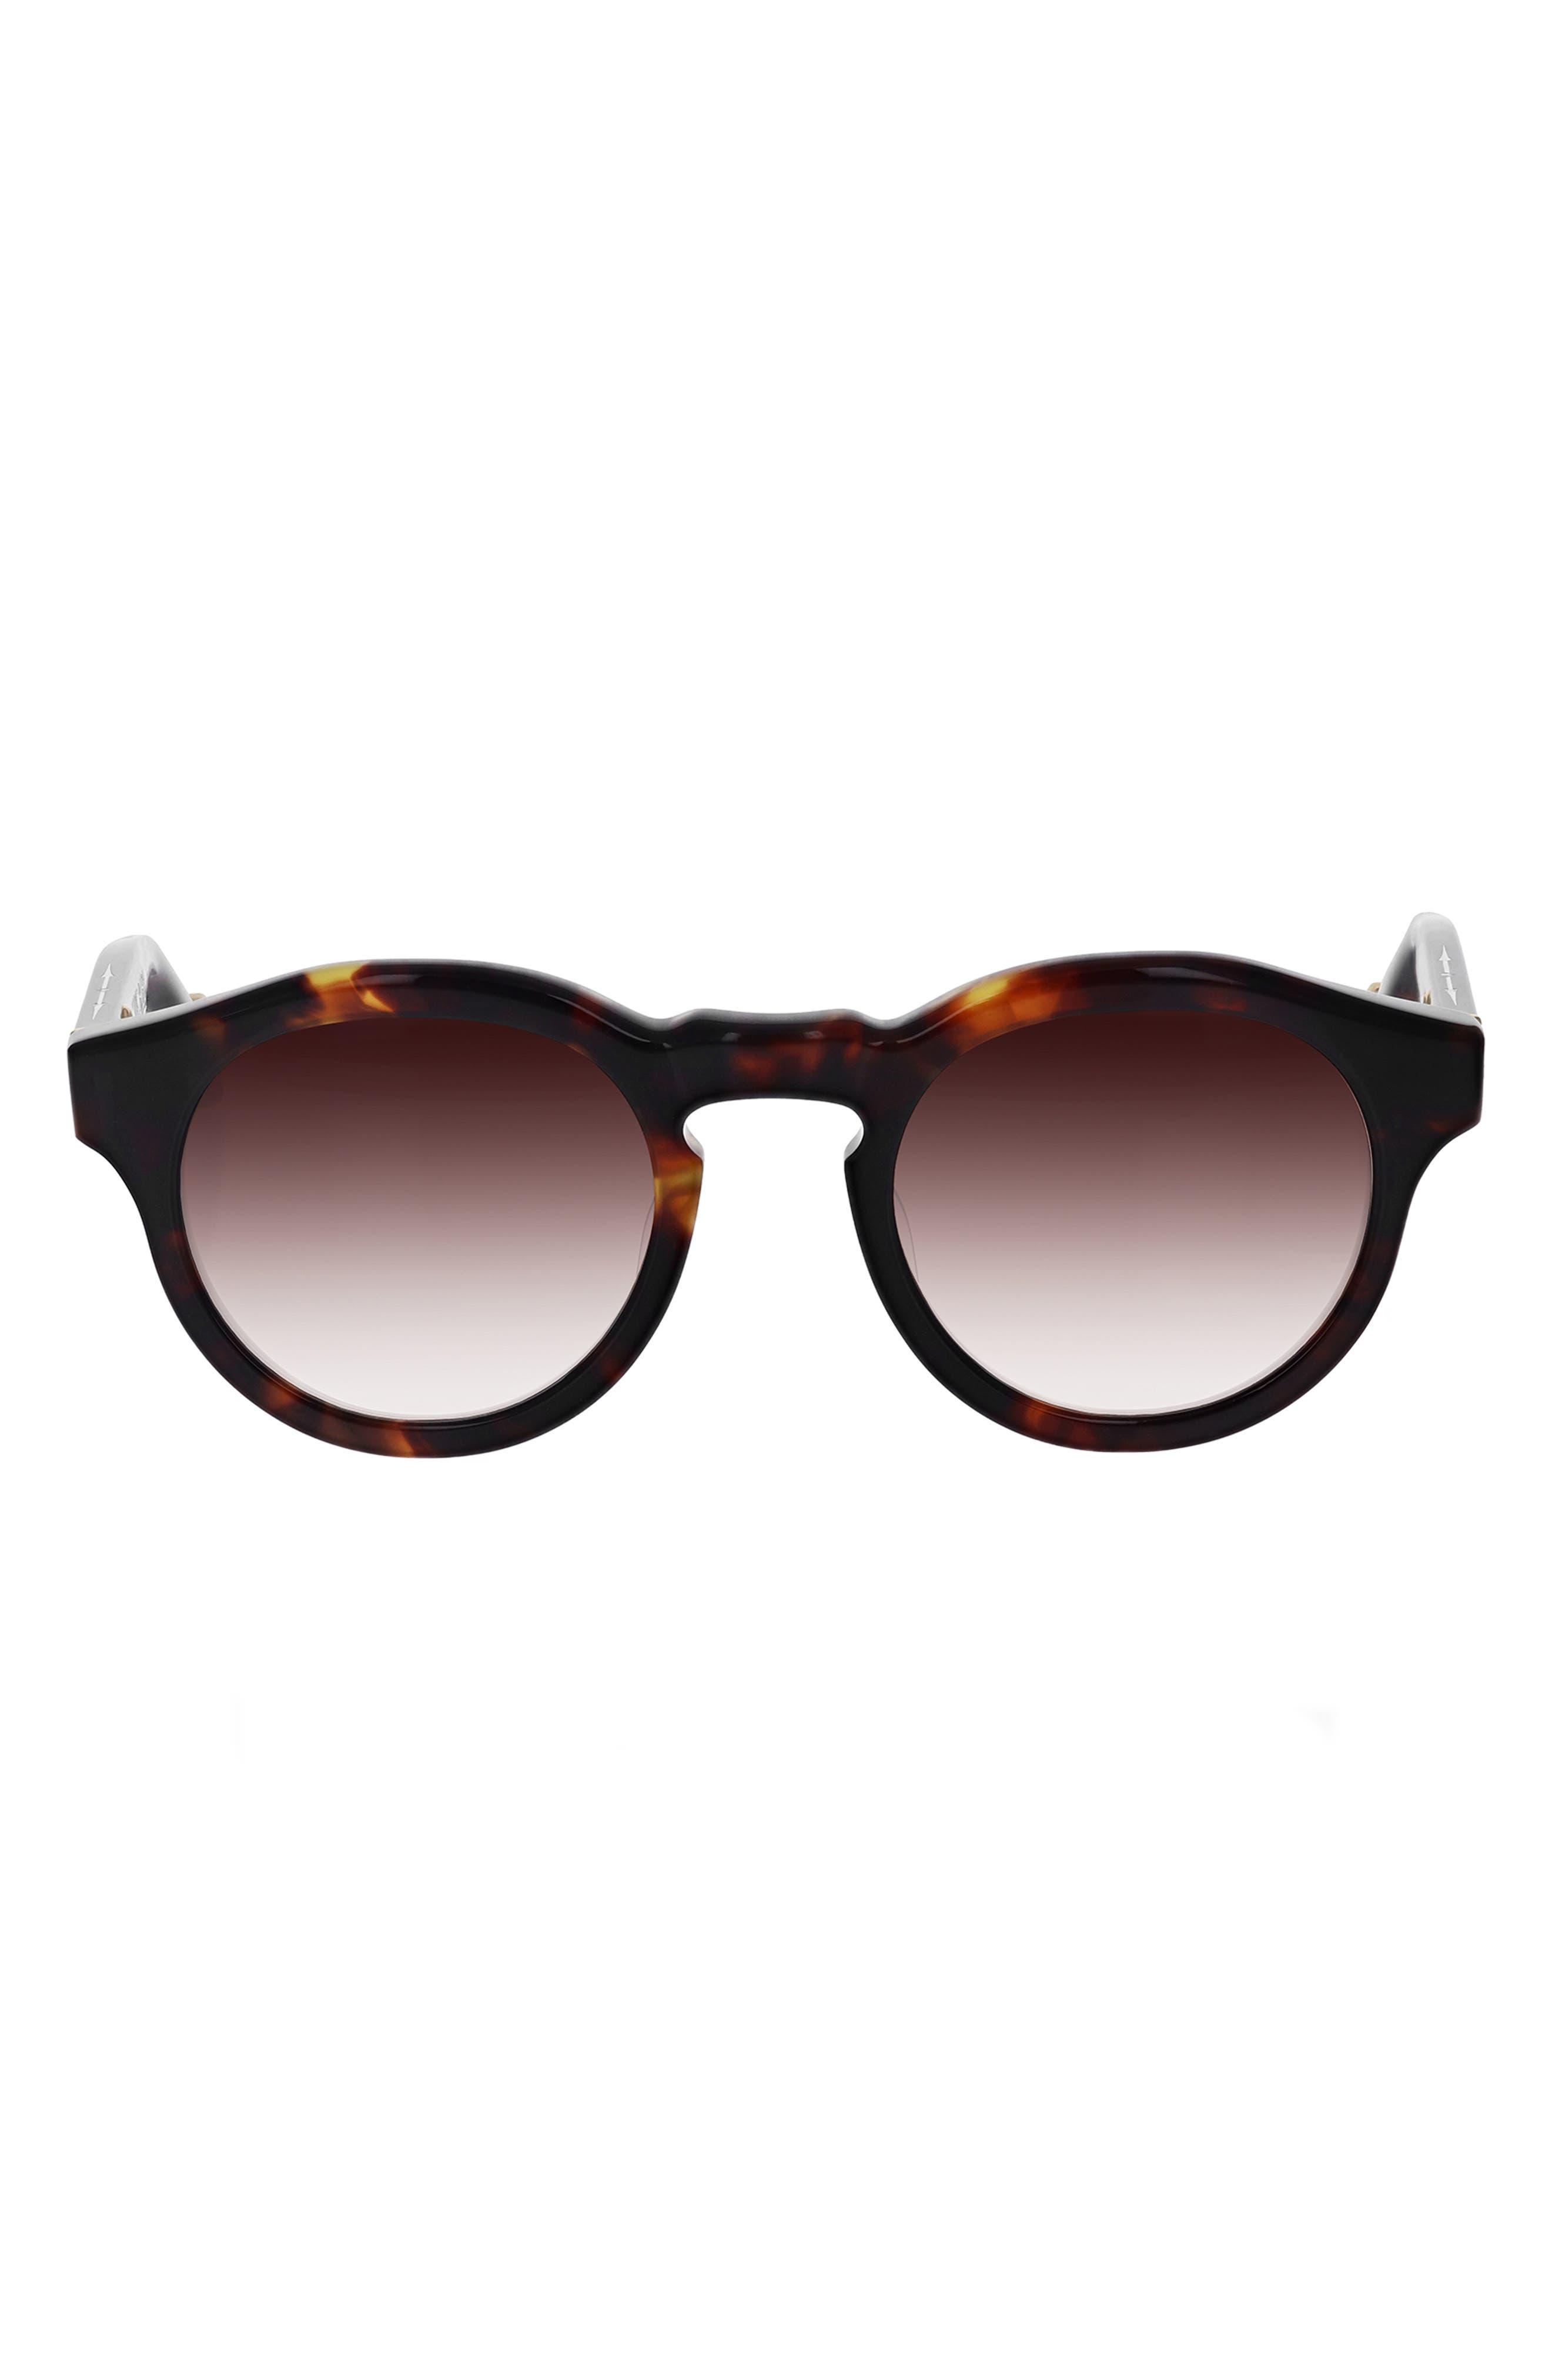 Nashville 48mm Round Gradient Sunglasses